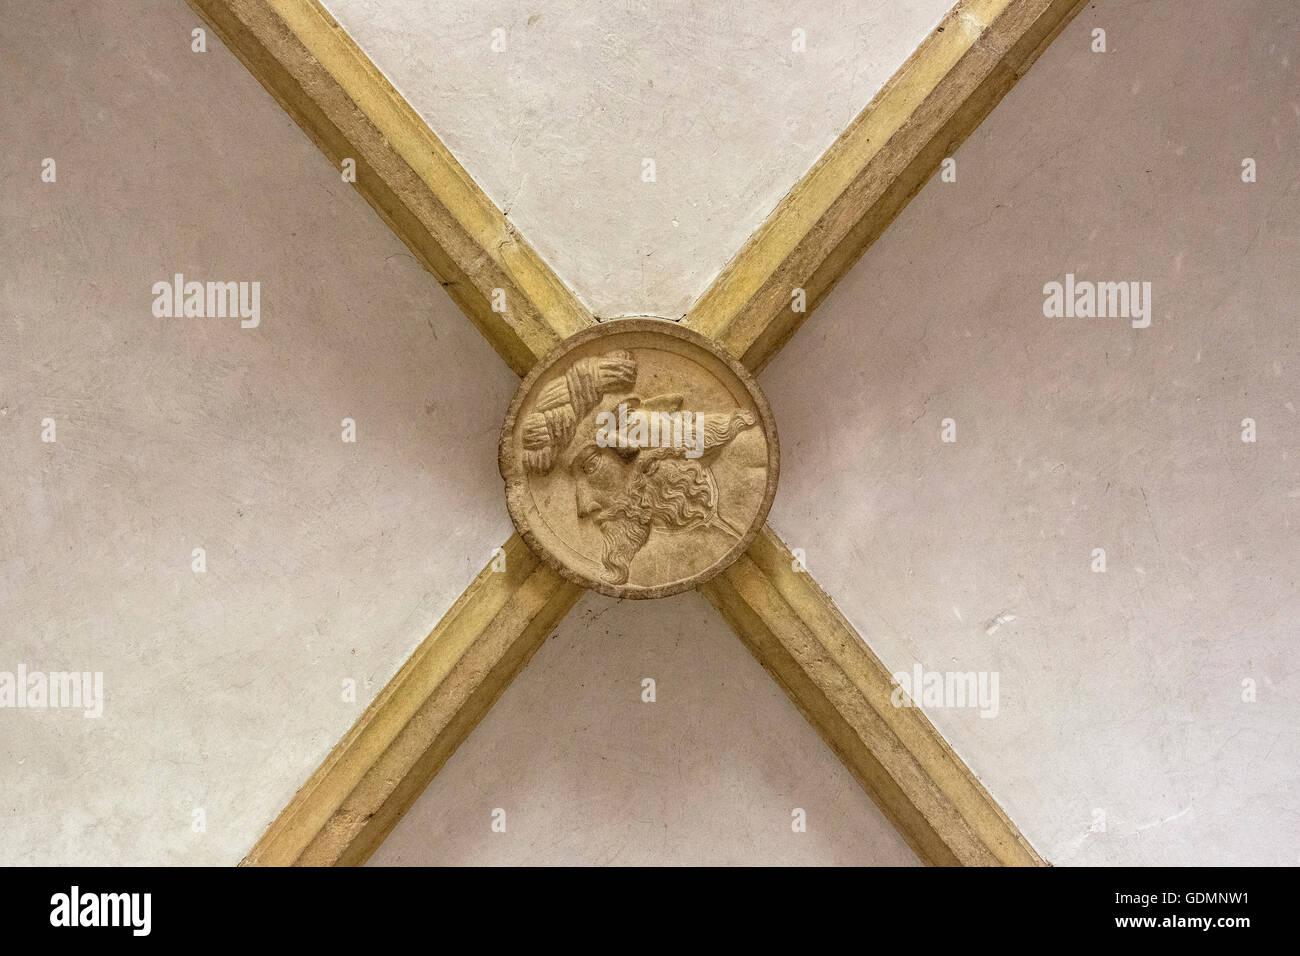 legendary keystone of the Templars fortress of Tomar, the castle of the Knights Templar, Templar, UNESCO Heritage, - Stock Image